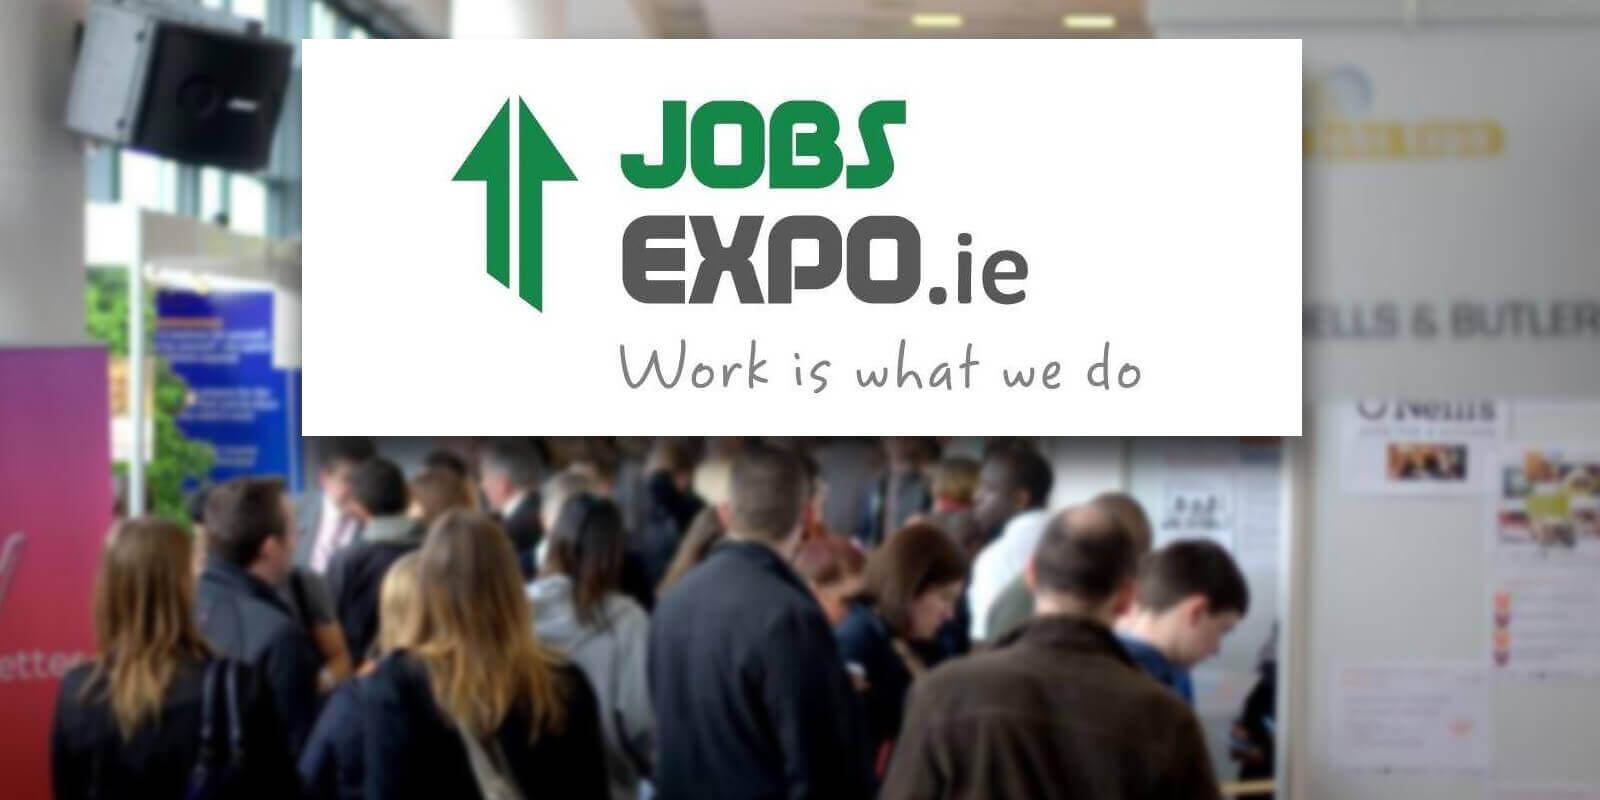 jobs expo ie jobs expo 2016